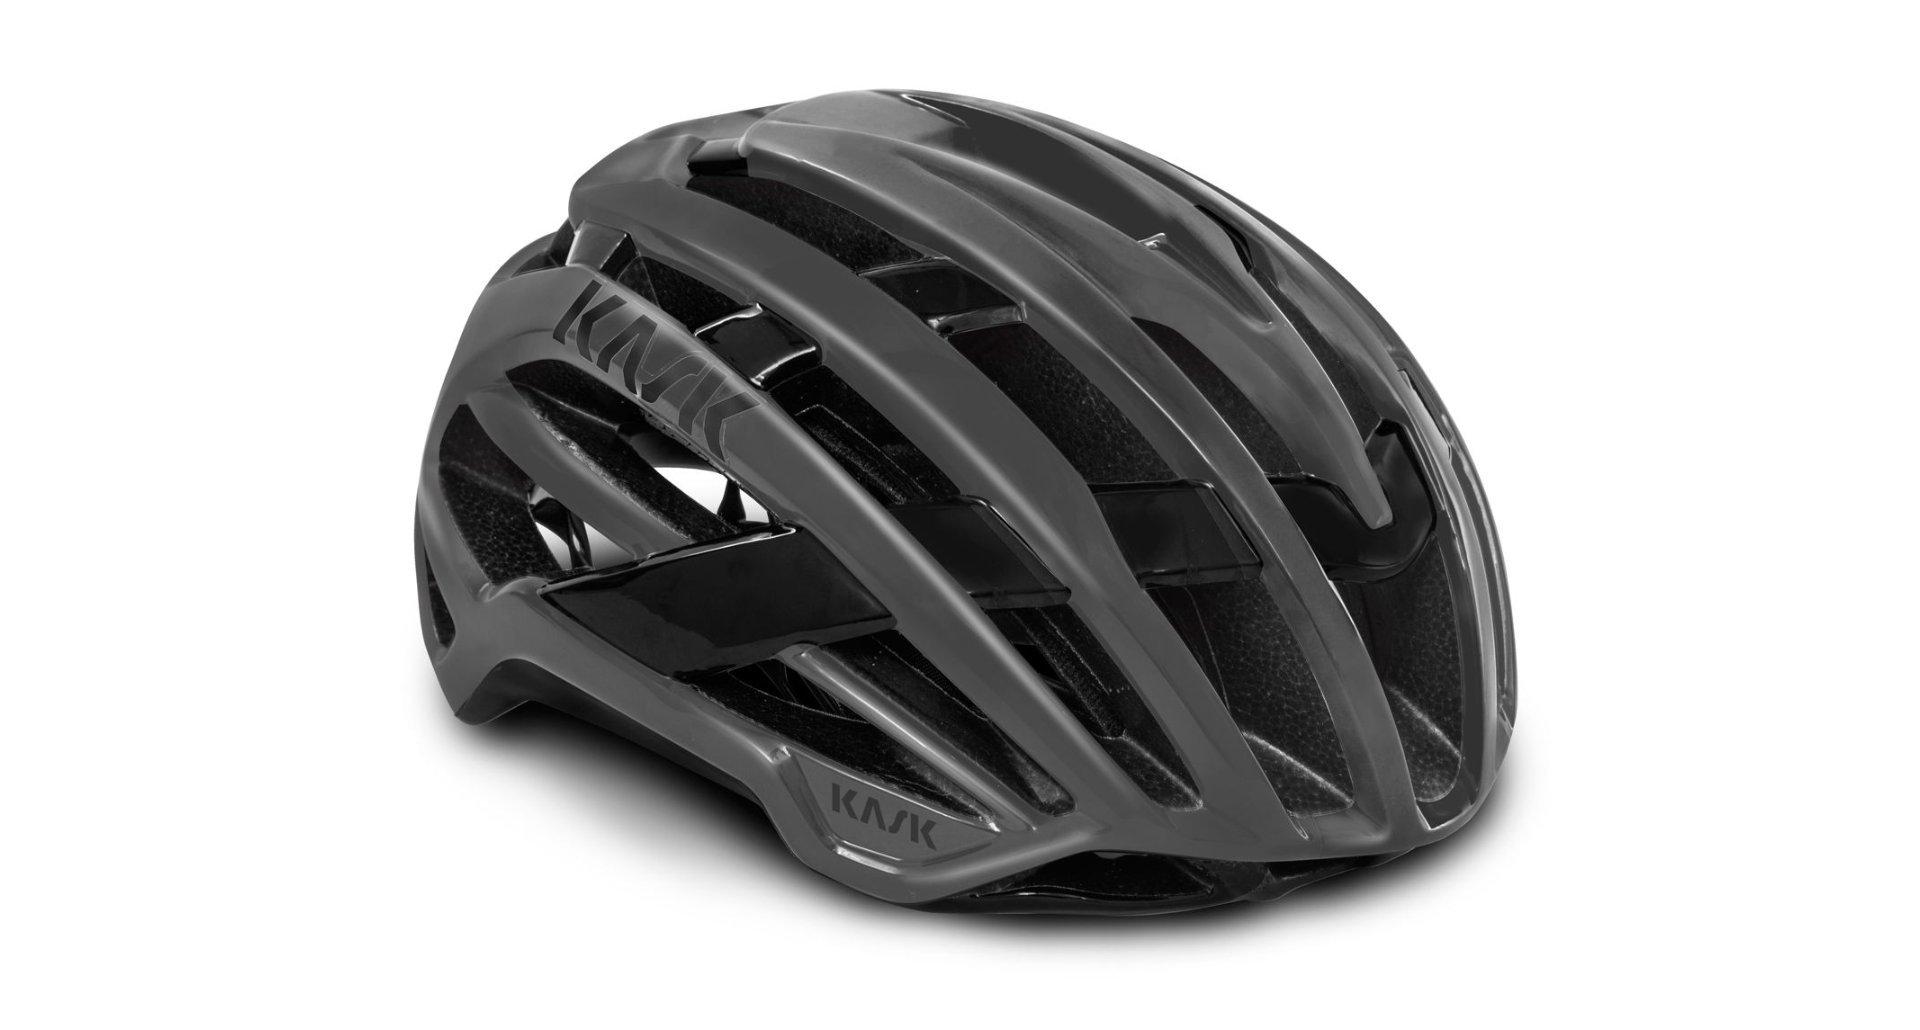 Kask Valegro Helmet, Small, Anthracite Matt